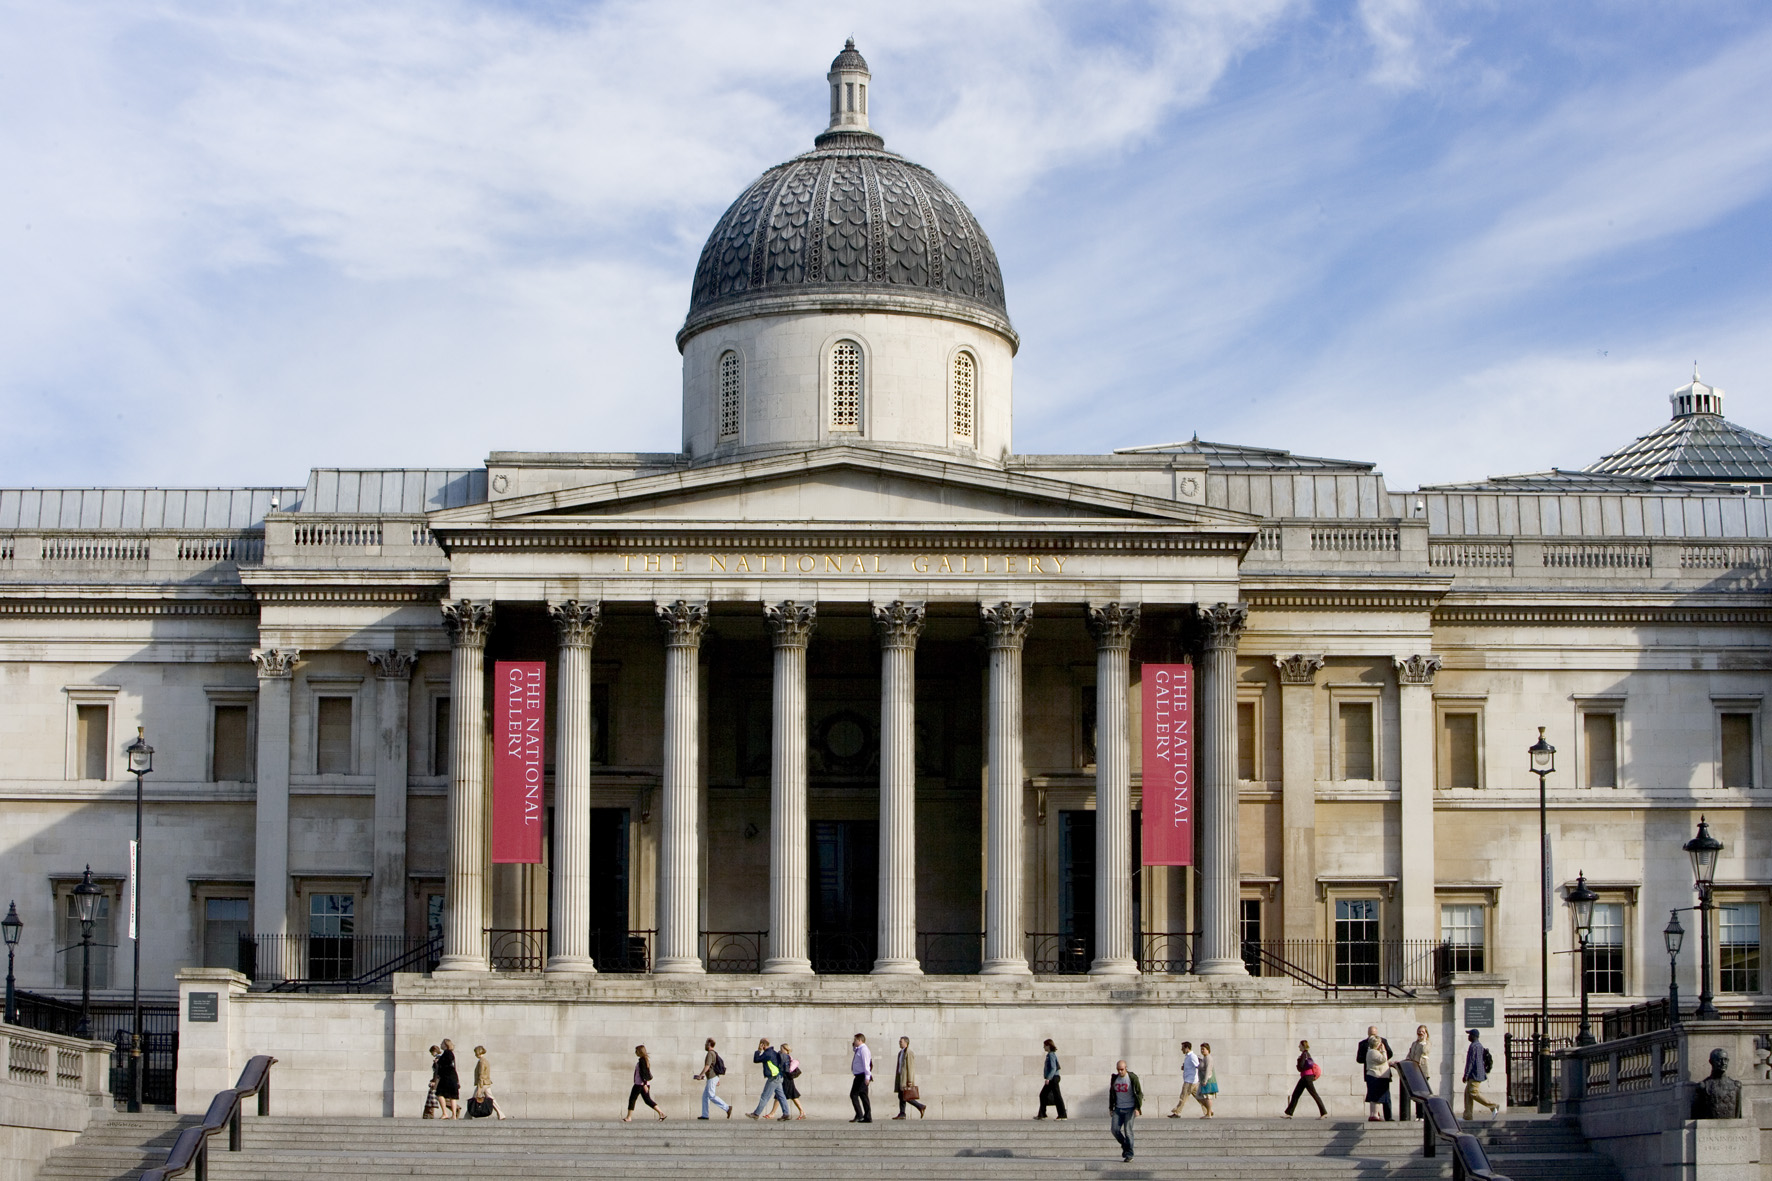 Alguns apontamentos sobre national gallery ateli 397 for Minimal art gallery london